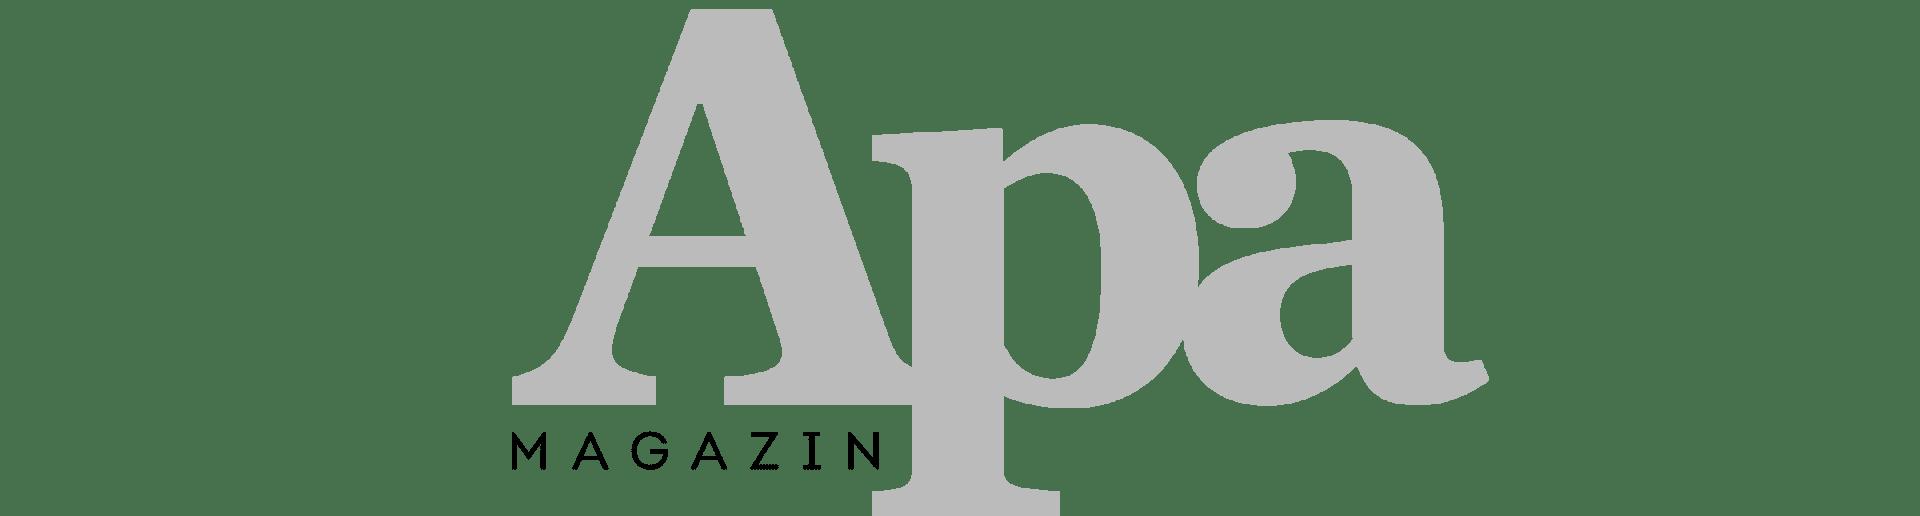 apa-2-magazin-logo